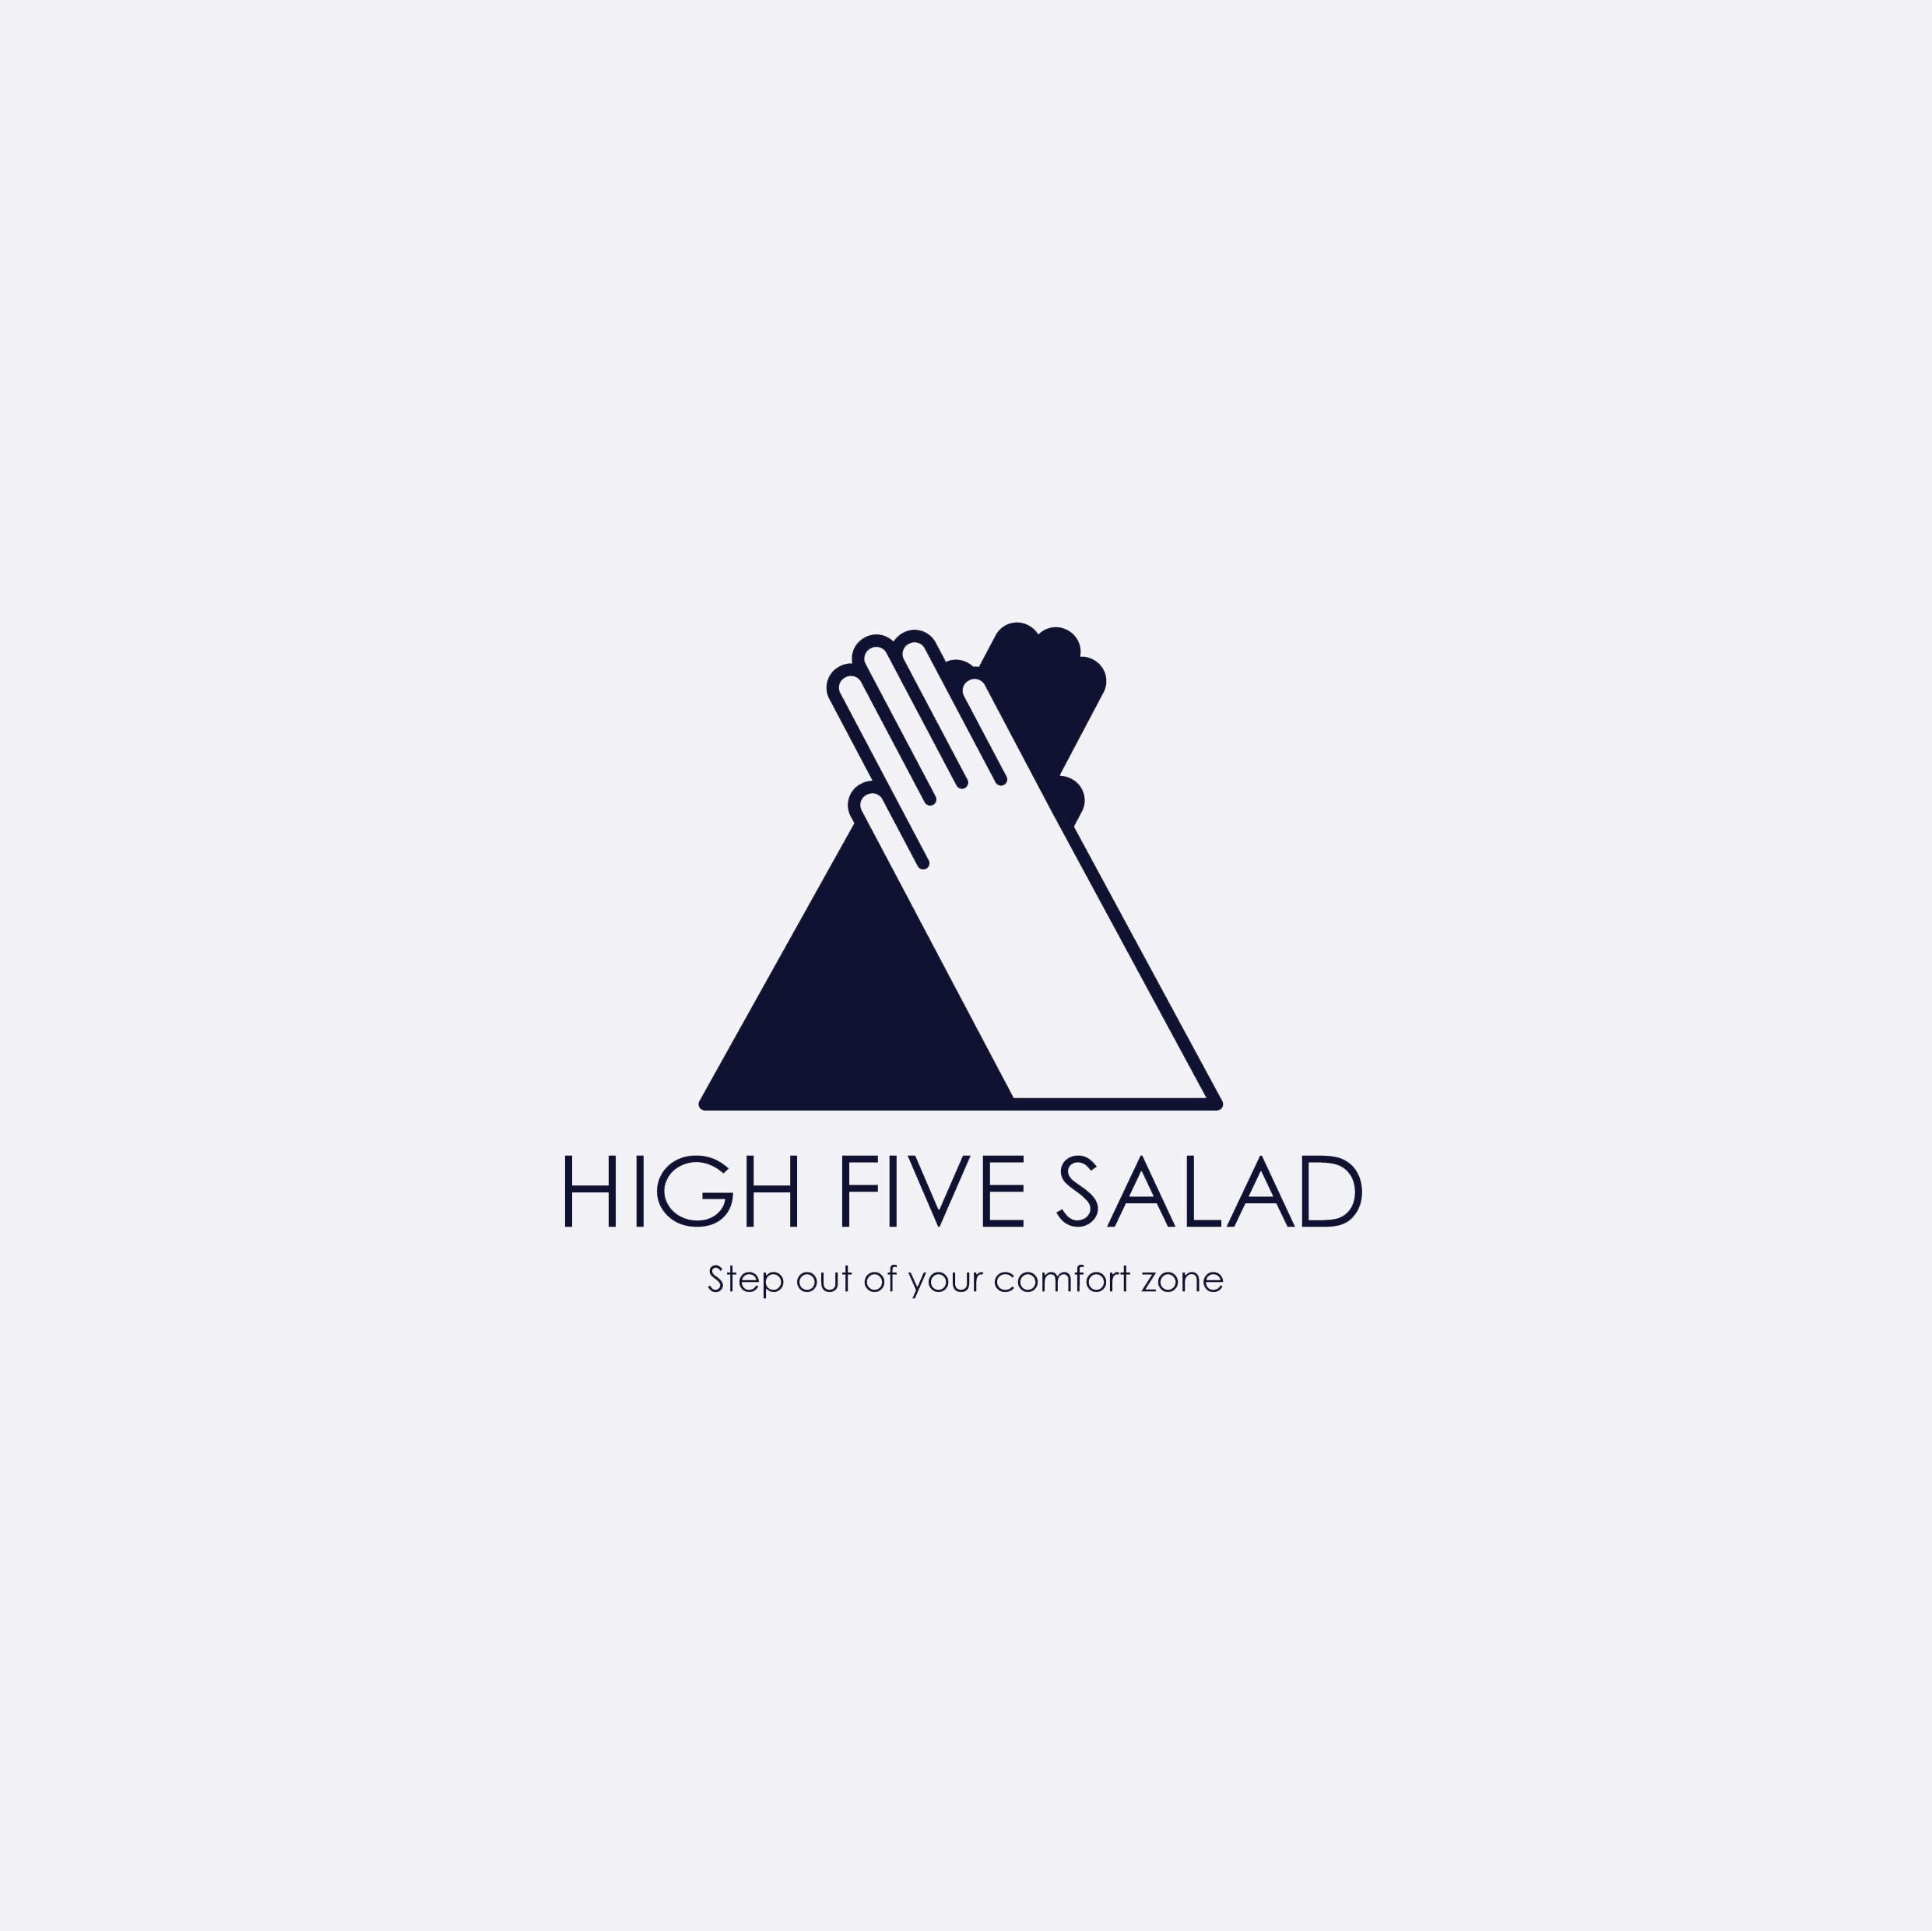 【HIGH FIVE SALAD】シンボルマーク(2018)